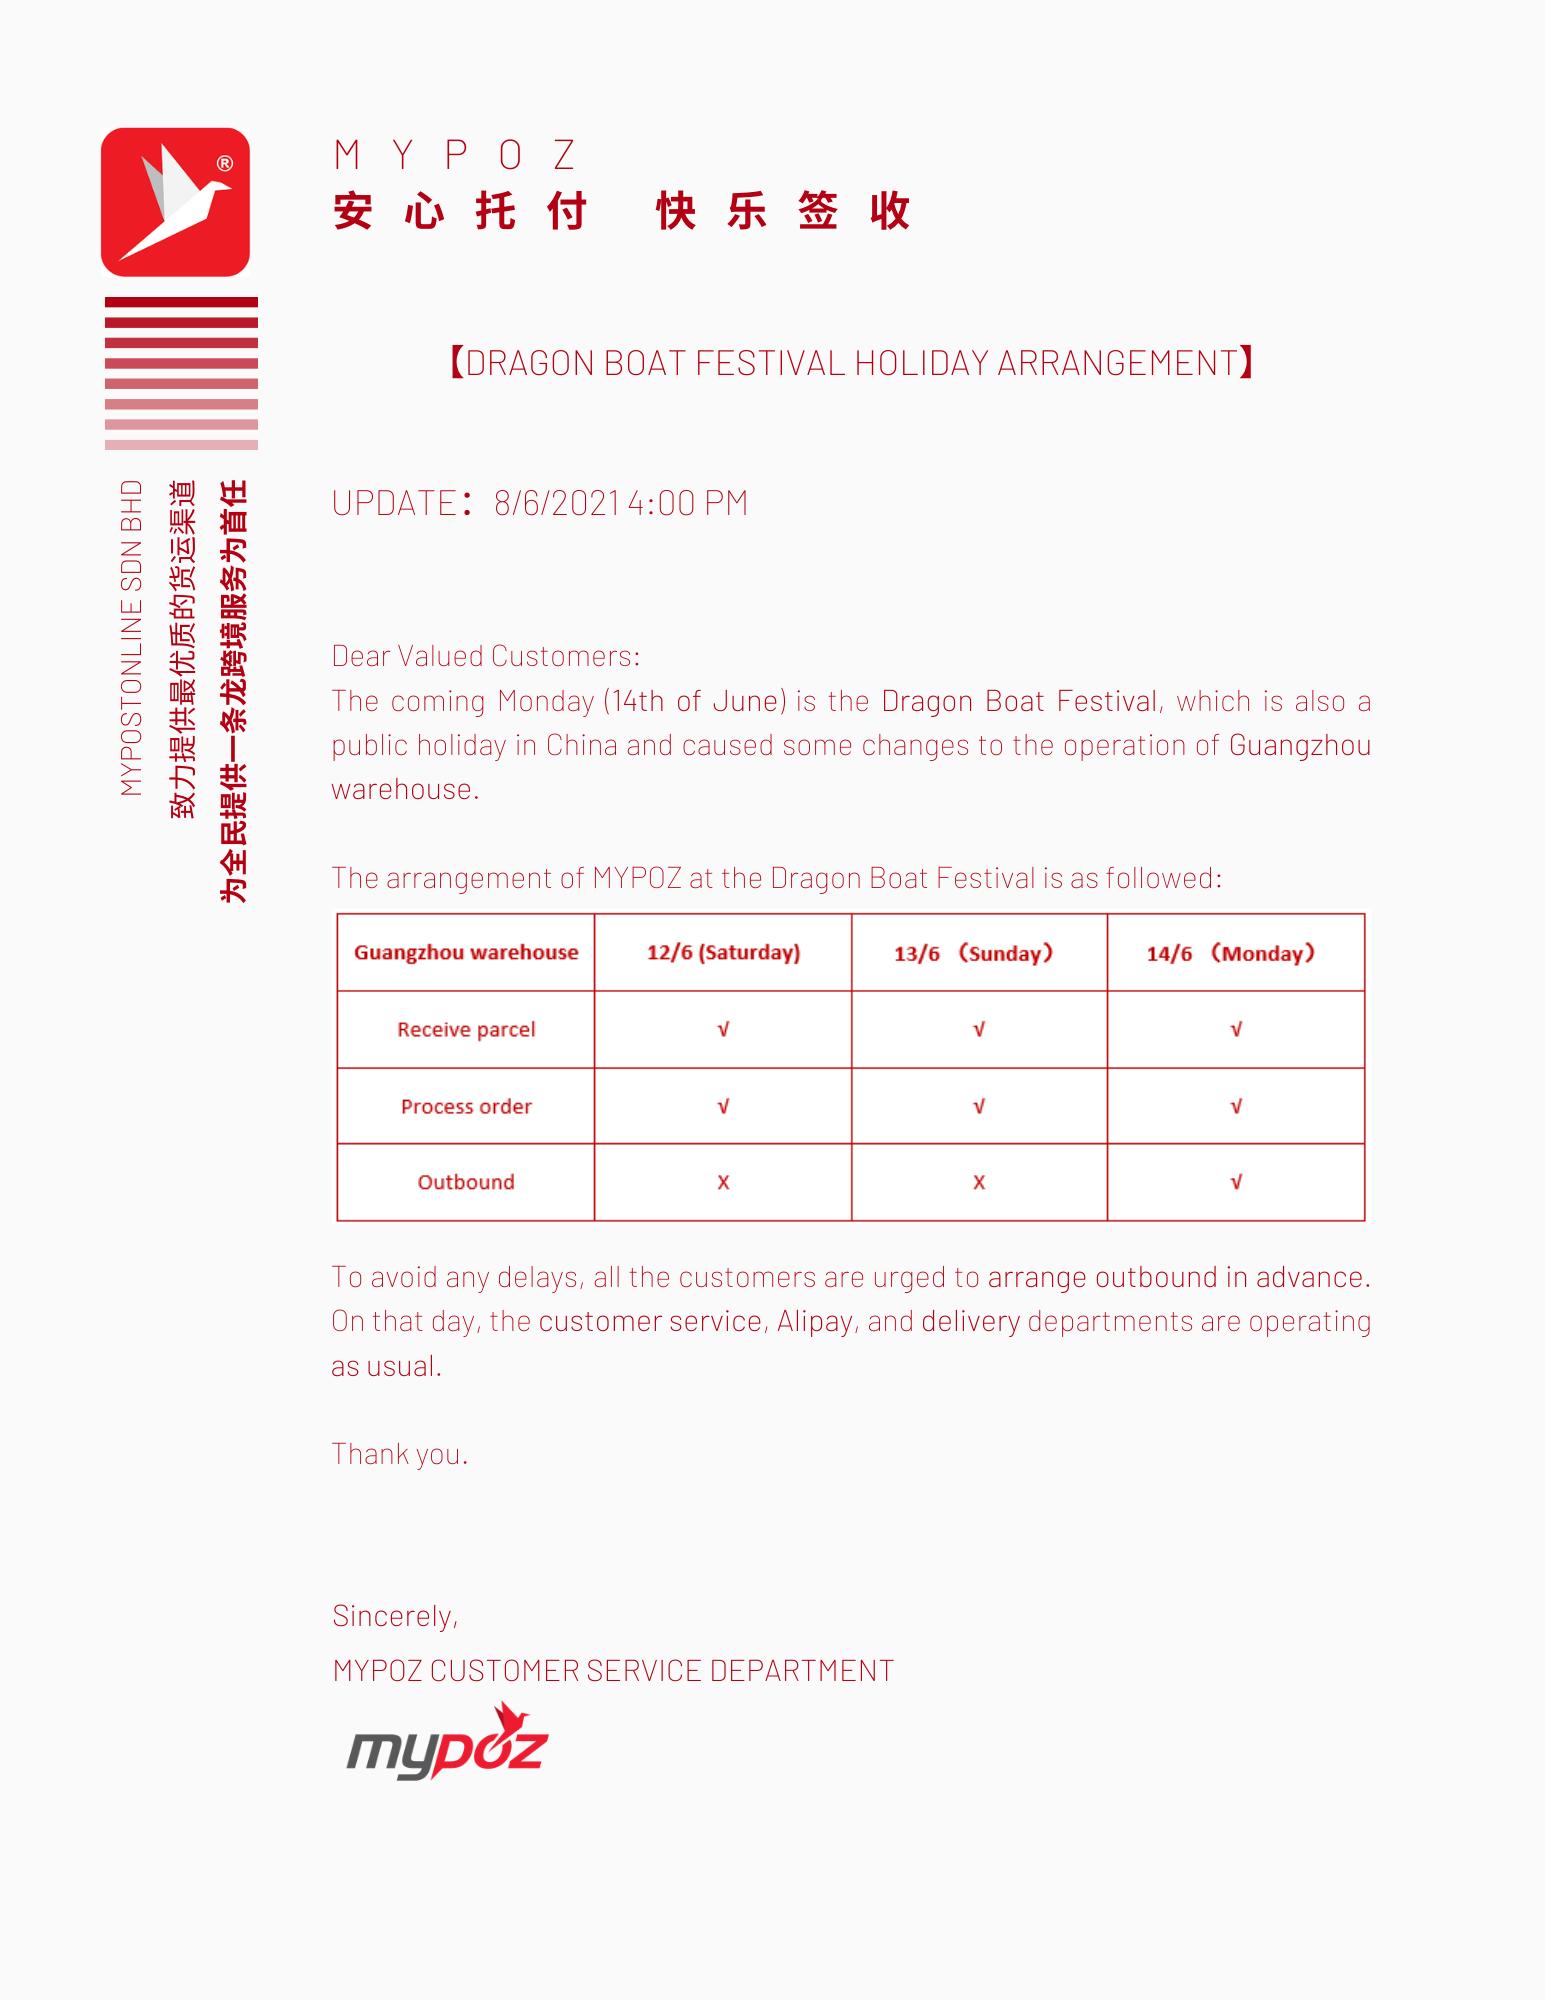 【NOTICE】DRAGON BOAT FESTIVAL HOLIDAY ARRANGEMENT